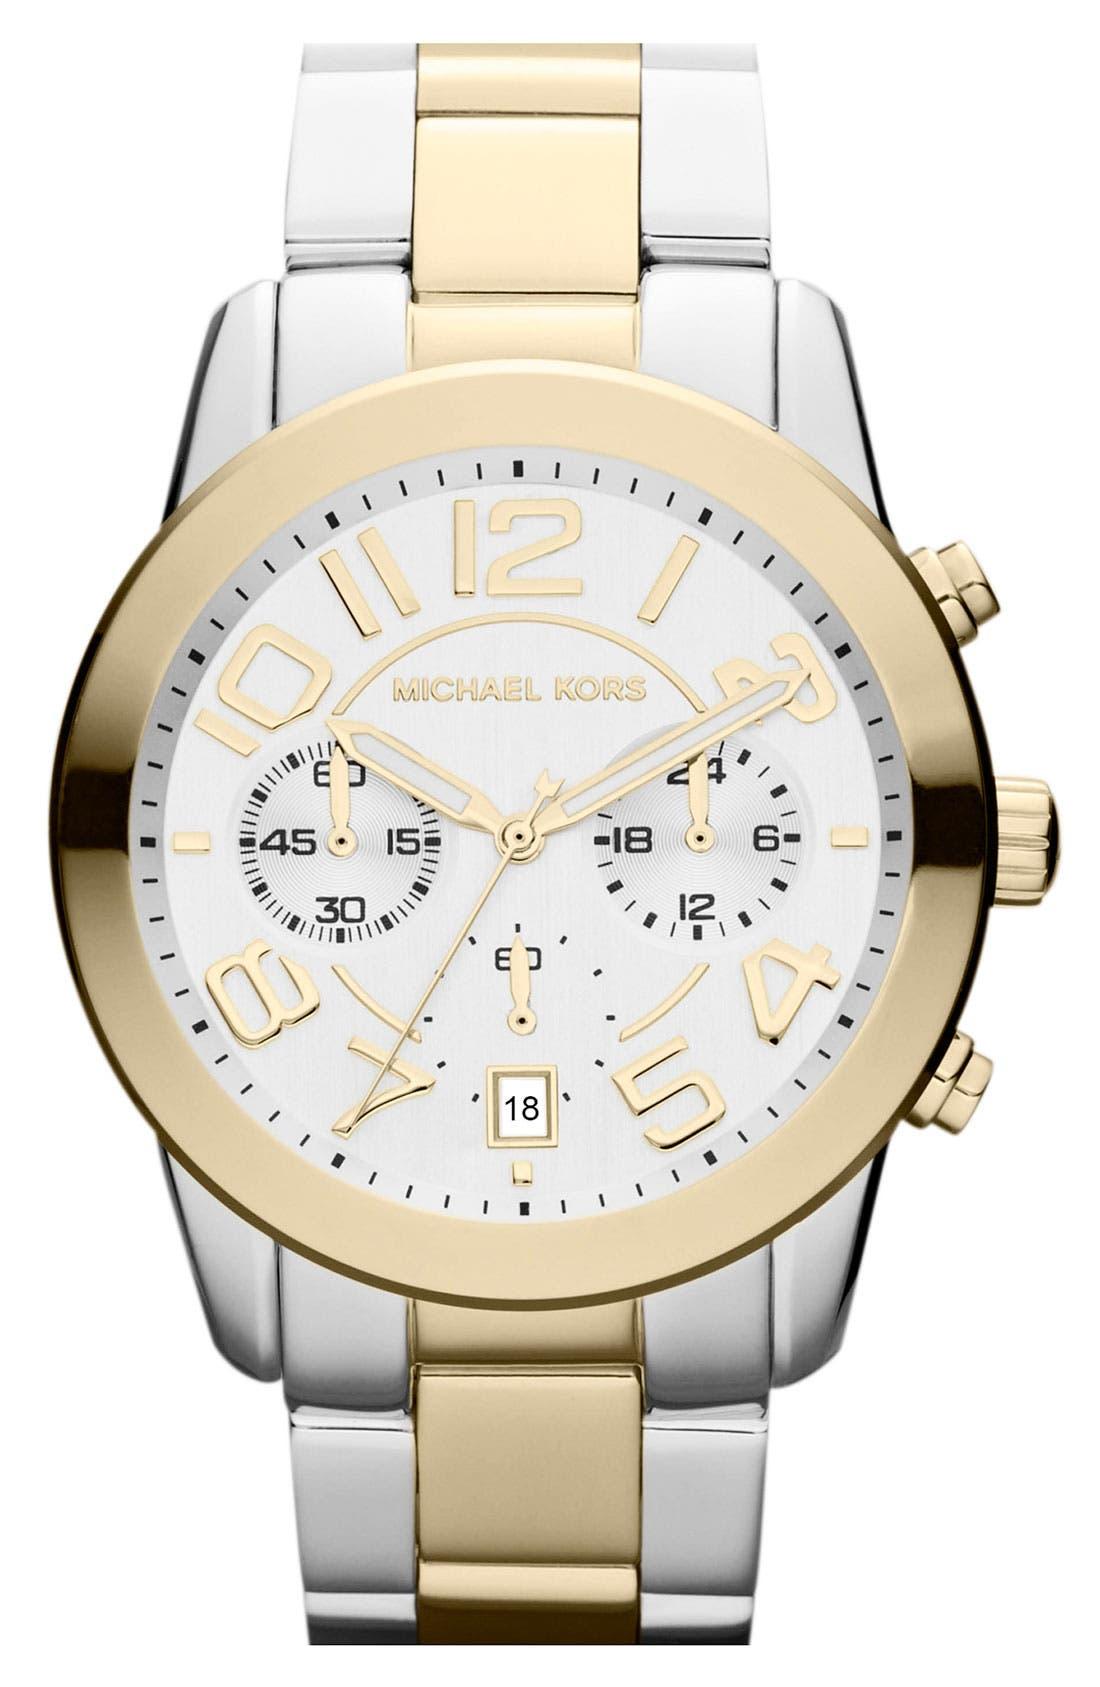 Main Image - Michael Kors 'Mercer' Chronograph Bracelet Watch, 41mm